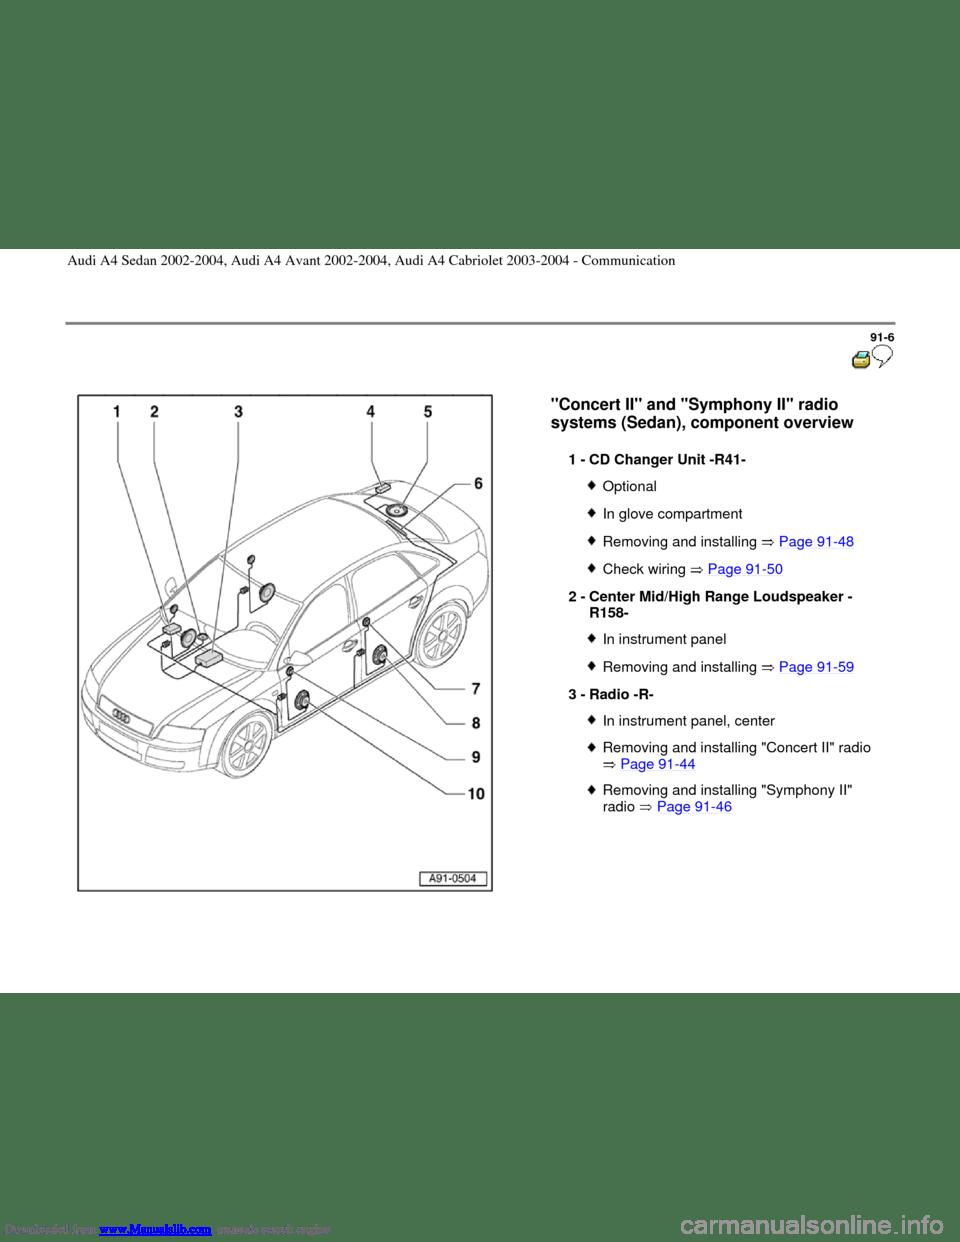 hight resolution of  audi concert ii wiring diagram audi accessories audi trailer on 1997